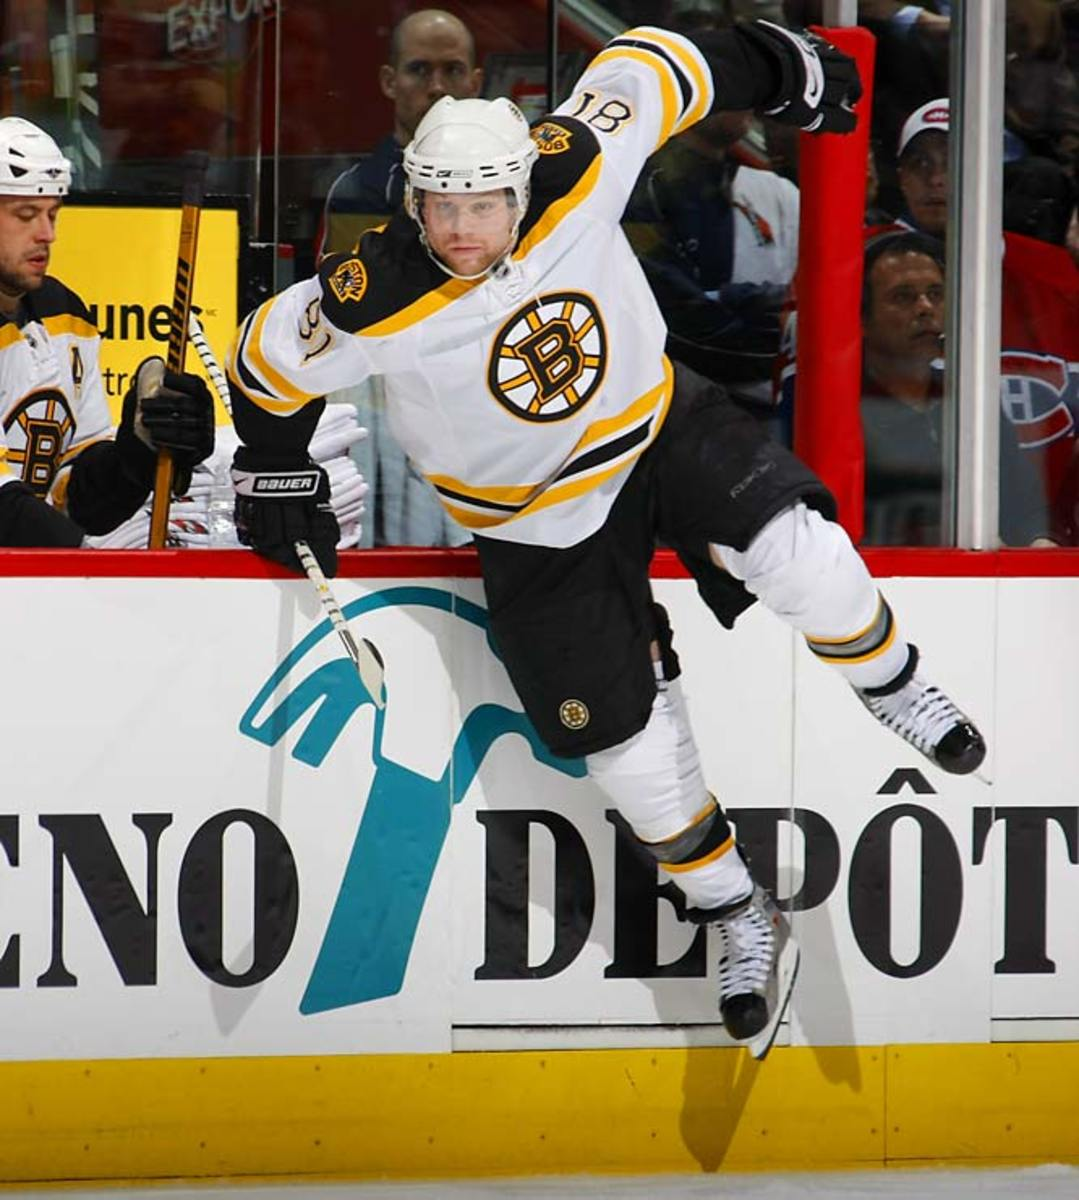 (1) Canadiens vs. (8) Bruins